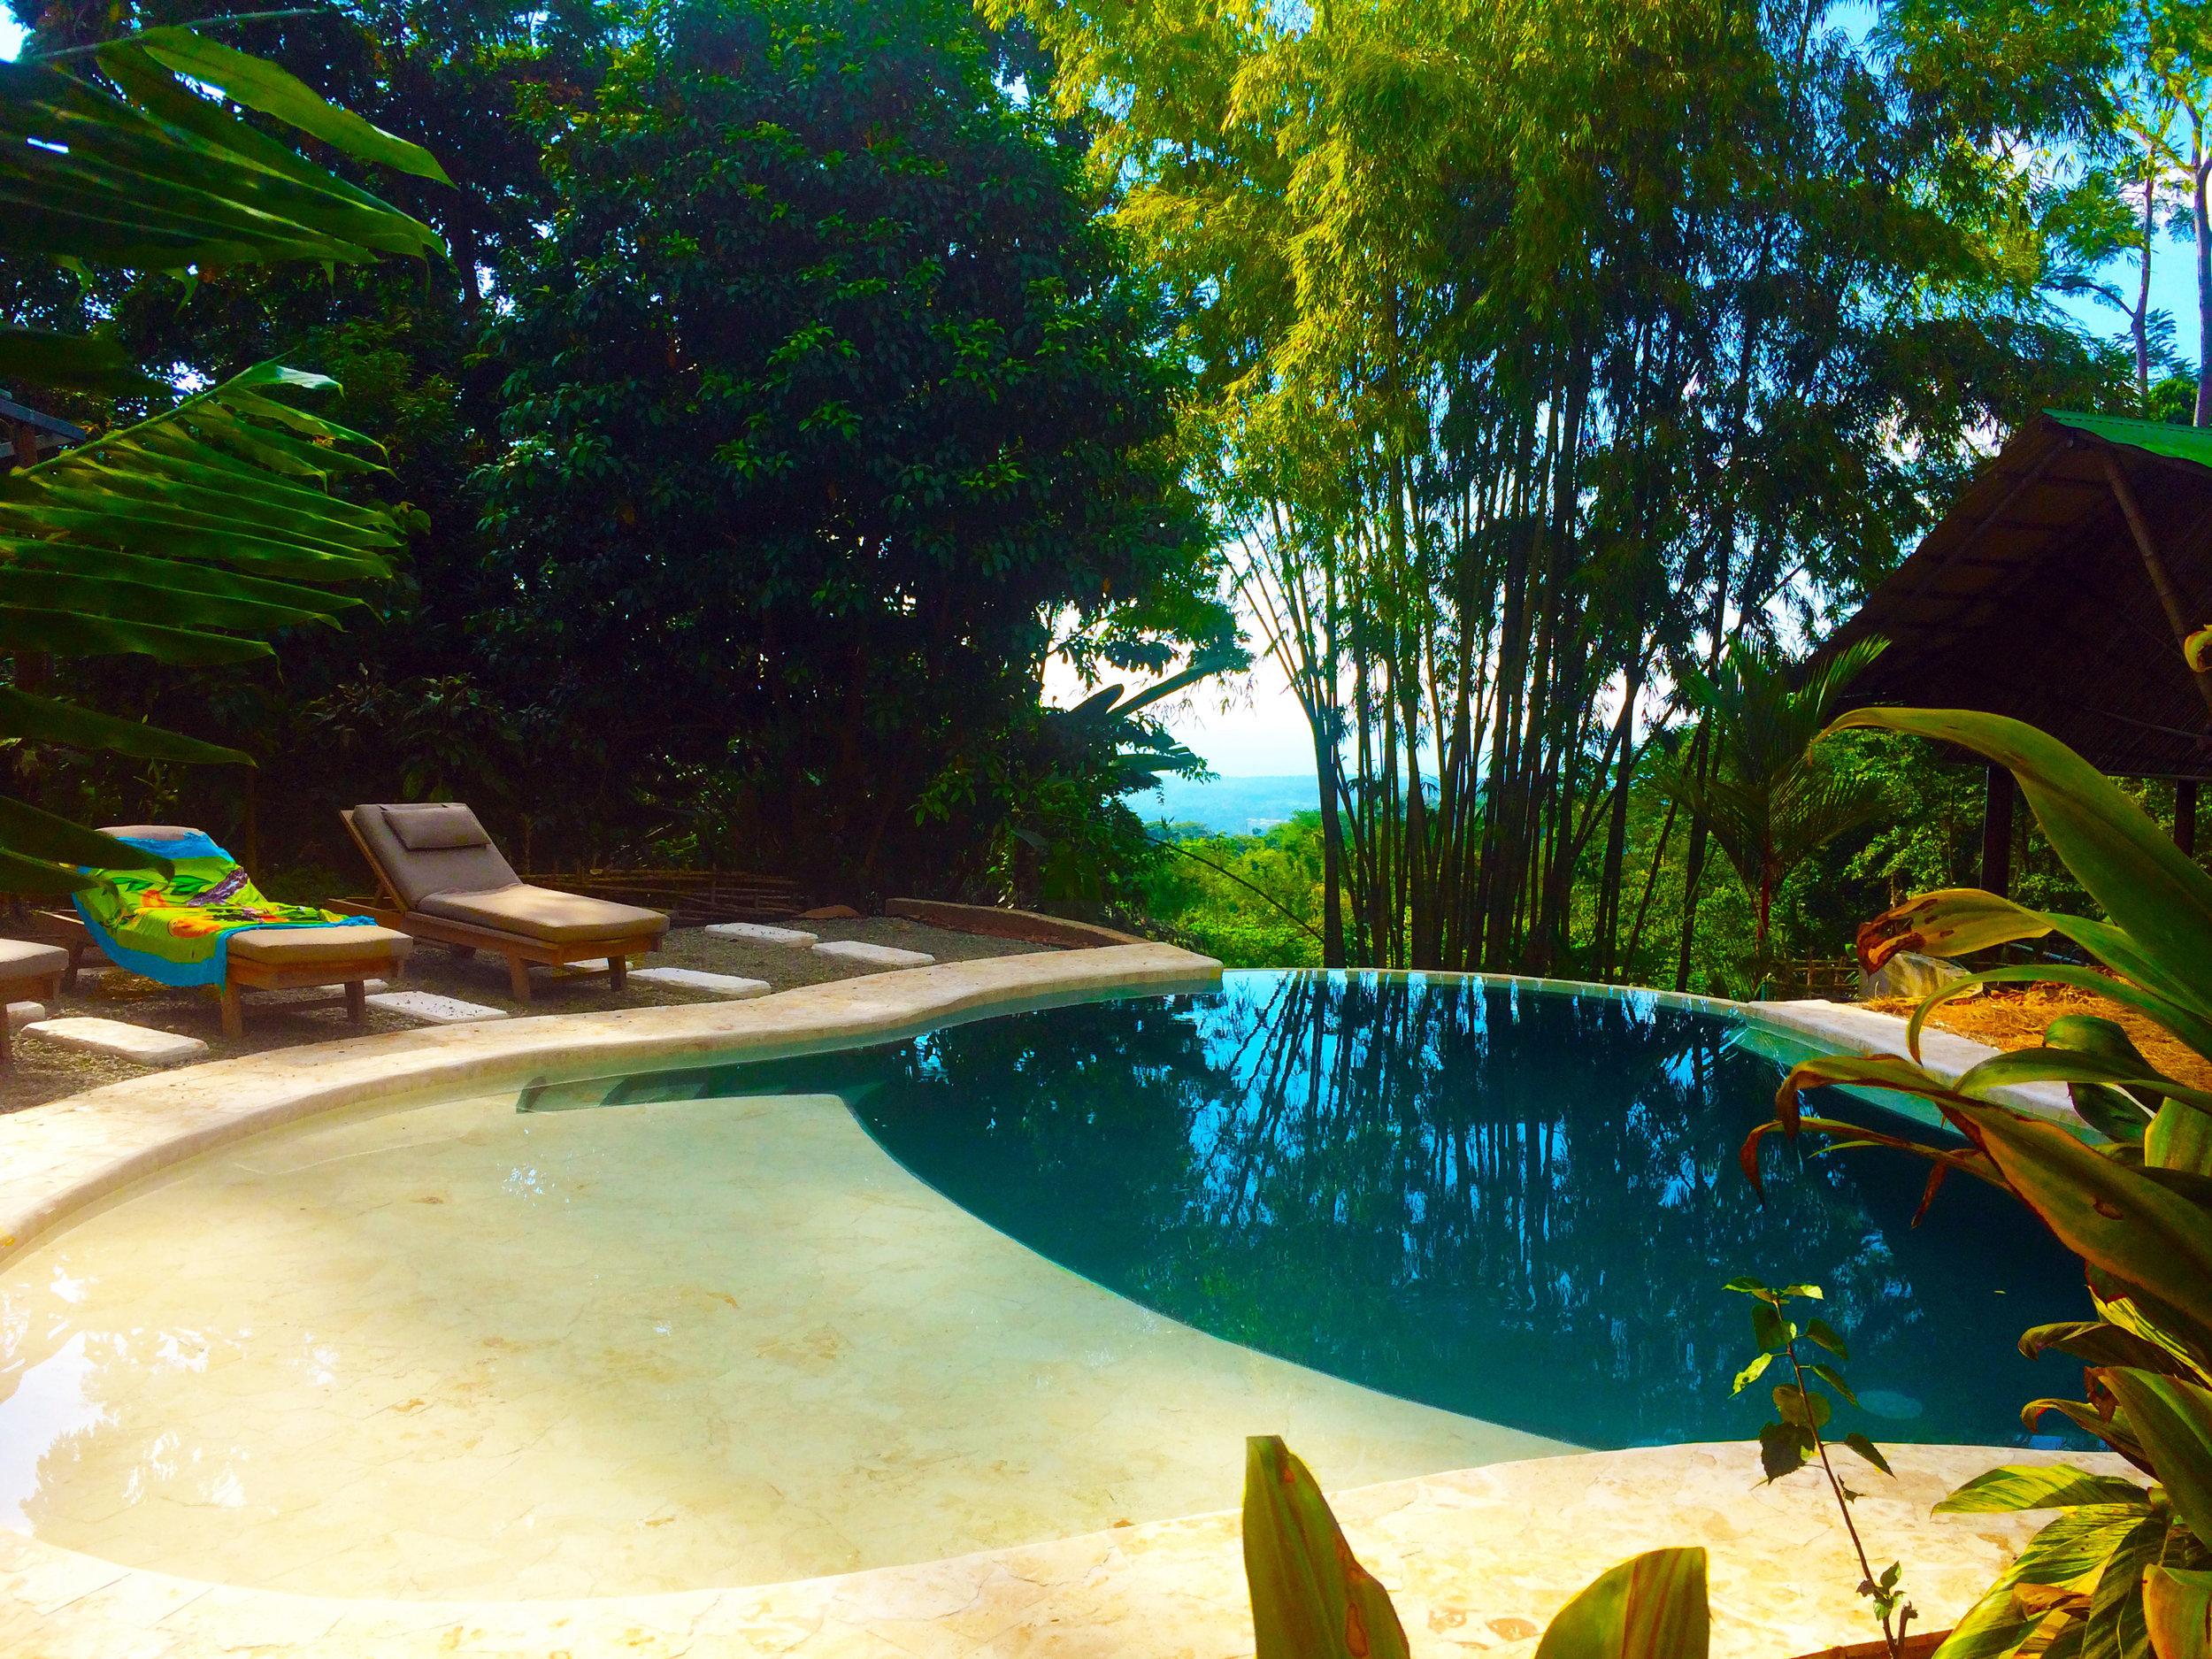 retreat_selva-armonia_yoga-november_2015-pool.jpg